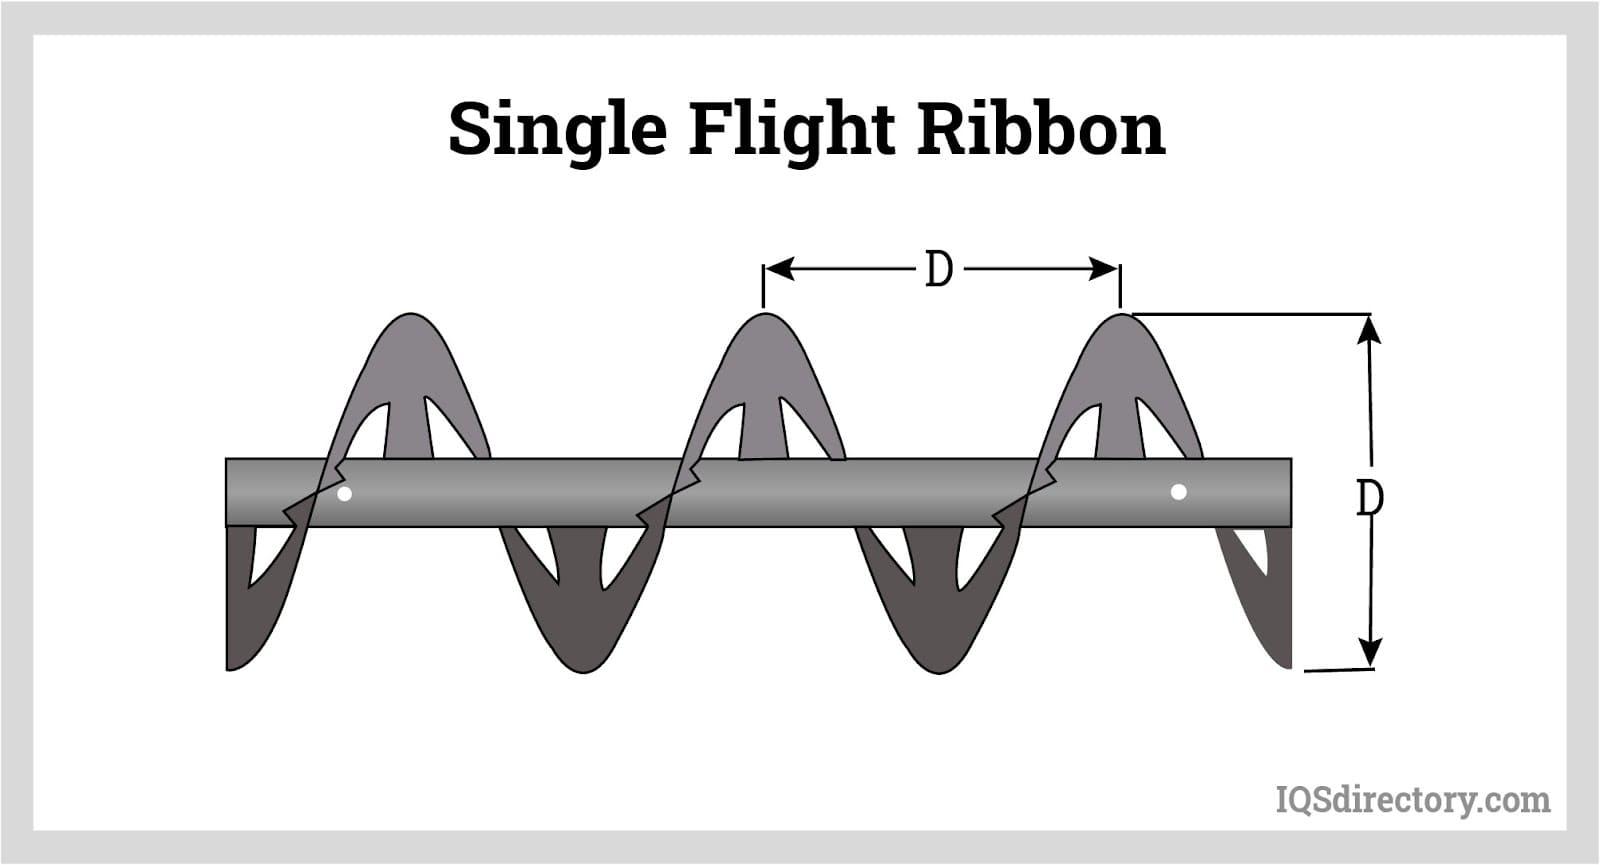 Single Flight Ribbon